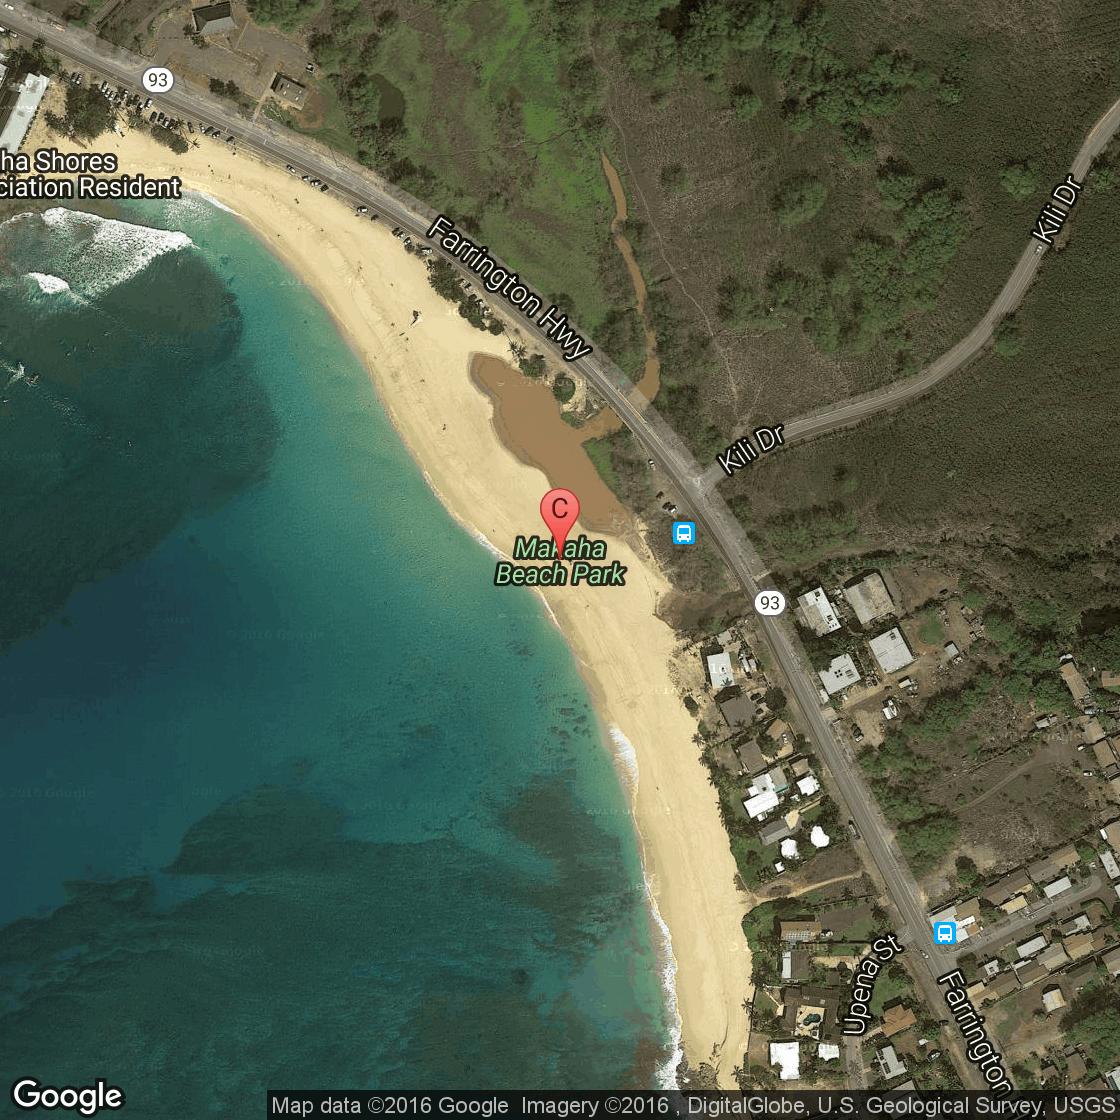 Snorkeling at Makaha Beach Park in Oahu, Hawaii | Hawaii in ... on honolulu neighborhood map, honolulu county map, pahoa map, kapaa map, kaha lani map, laie map, hawaiian paradise park map, north kohala map, lanikai map, waianae map, kahala map, sunset map, waipahu map, makawao map, mililani map, honolulu bus route map, hawaiian beaches map, pauoa valley map, punaluu map, aina haina map,